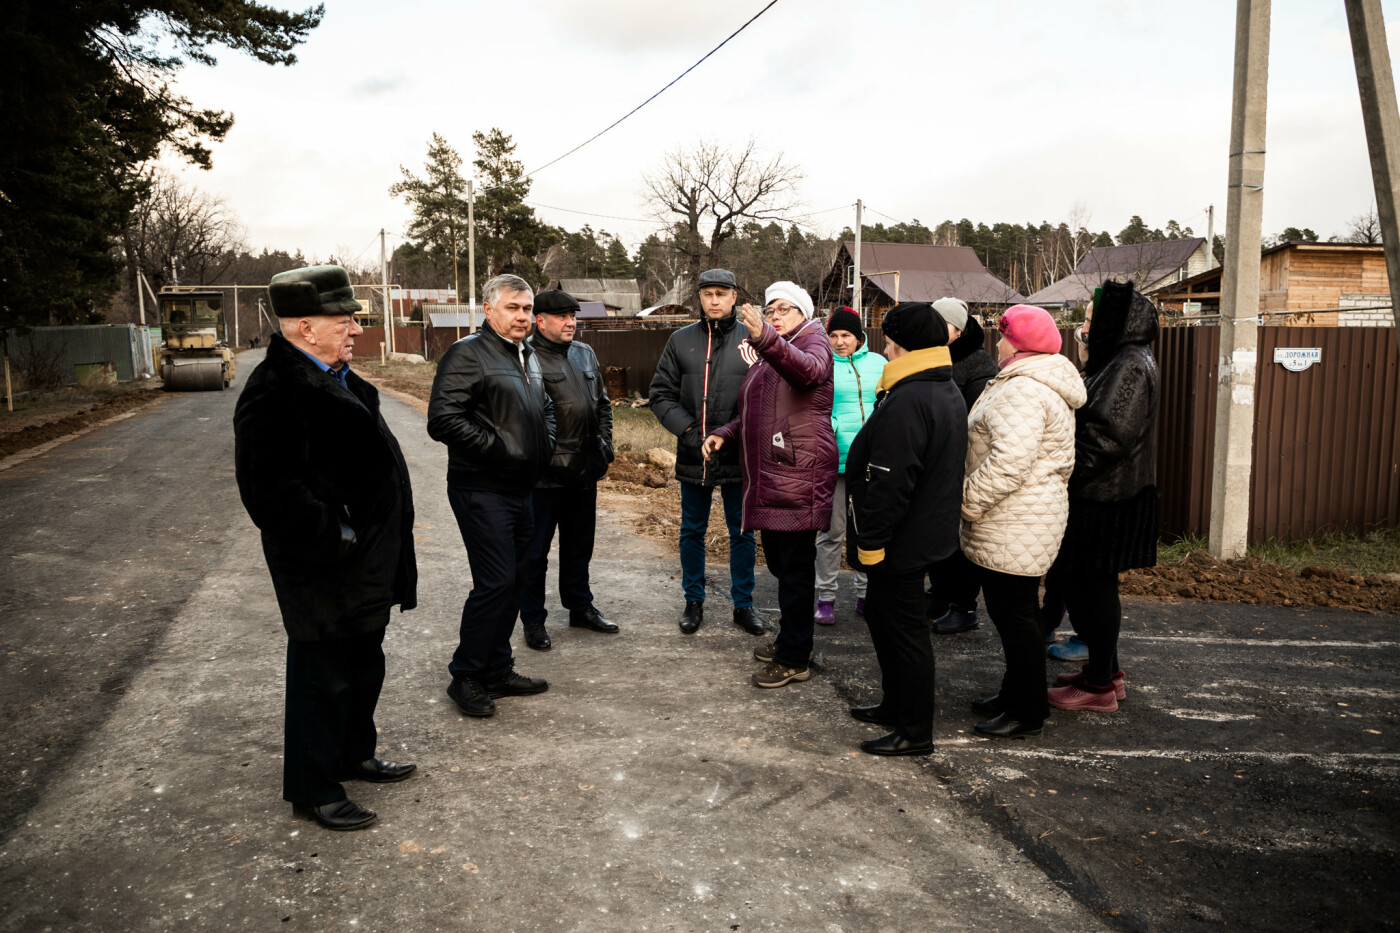 В пригороде Тамбова построили новую дорогу за 3,4 млн рублей, фото-6